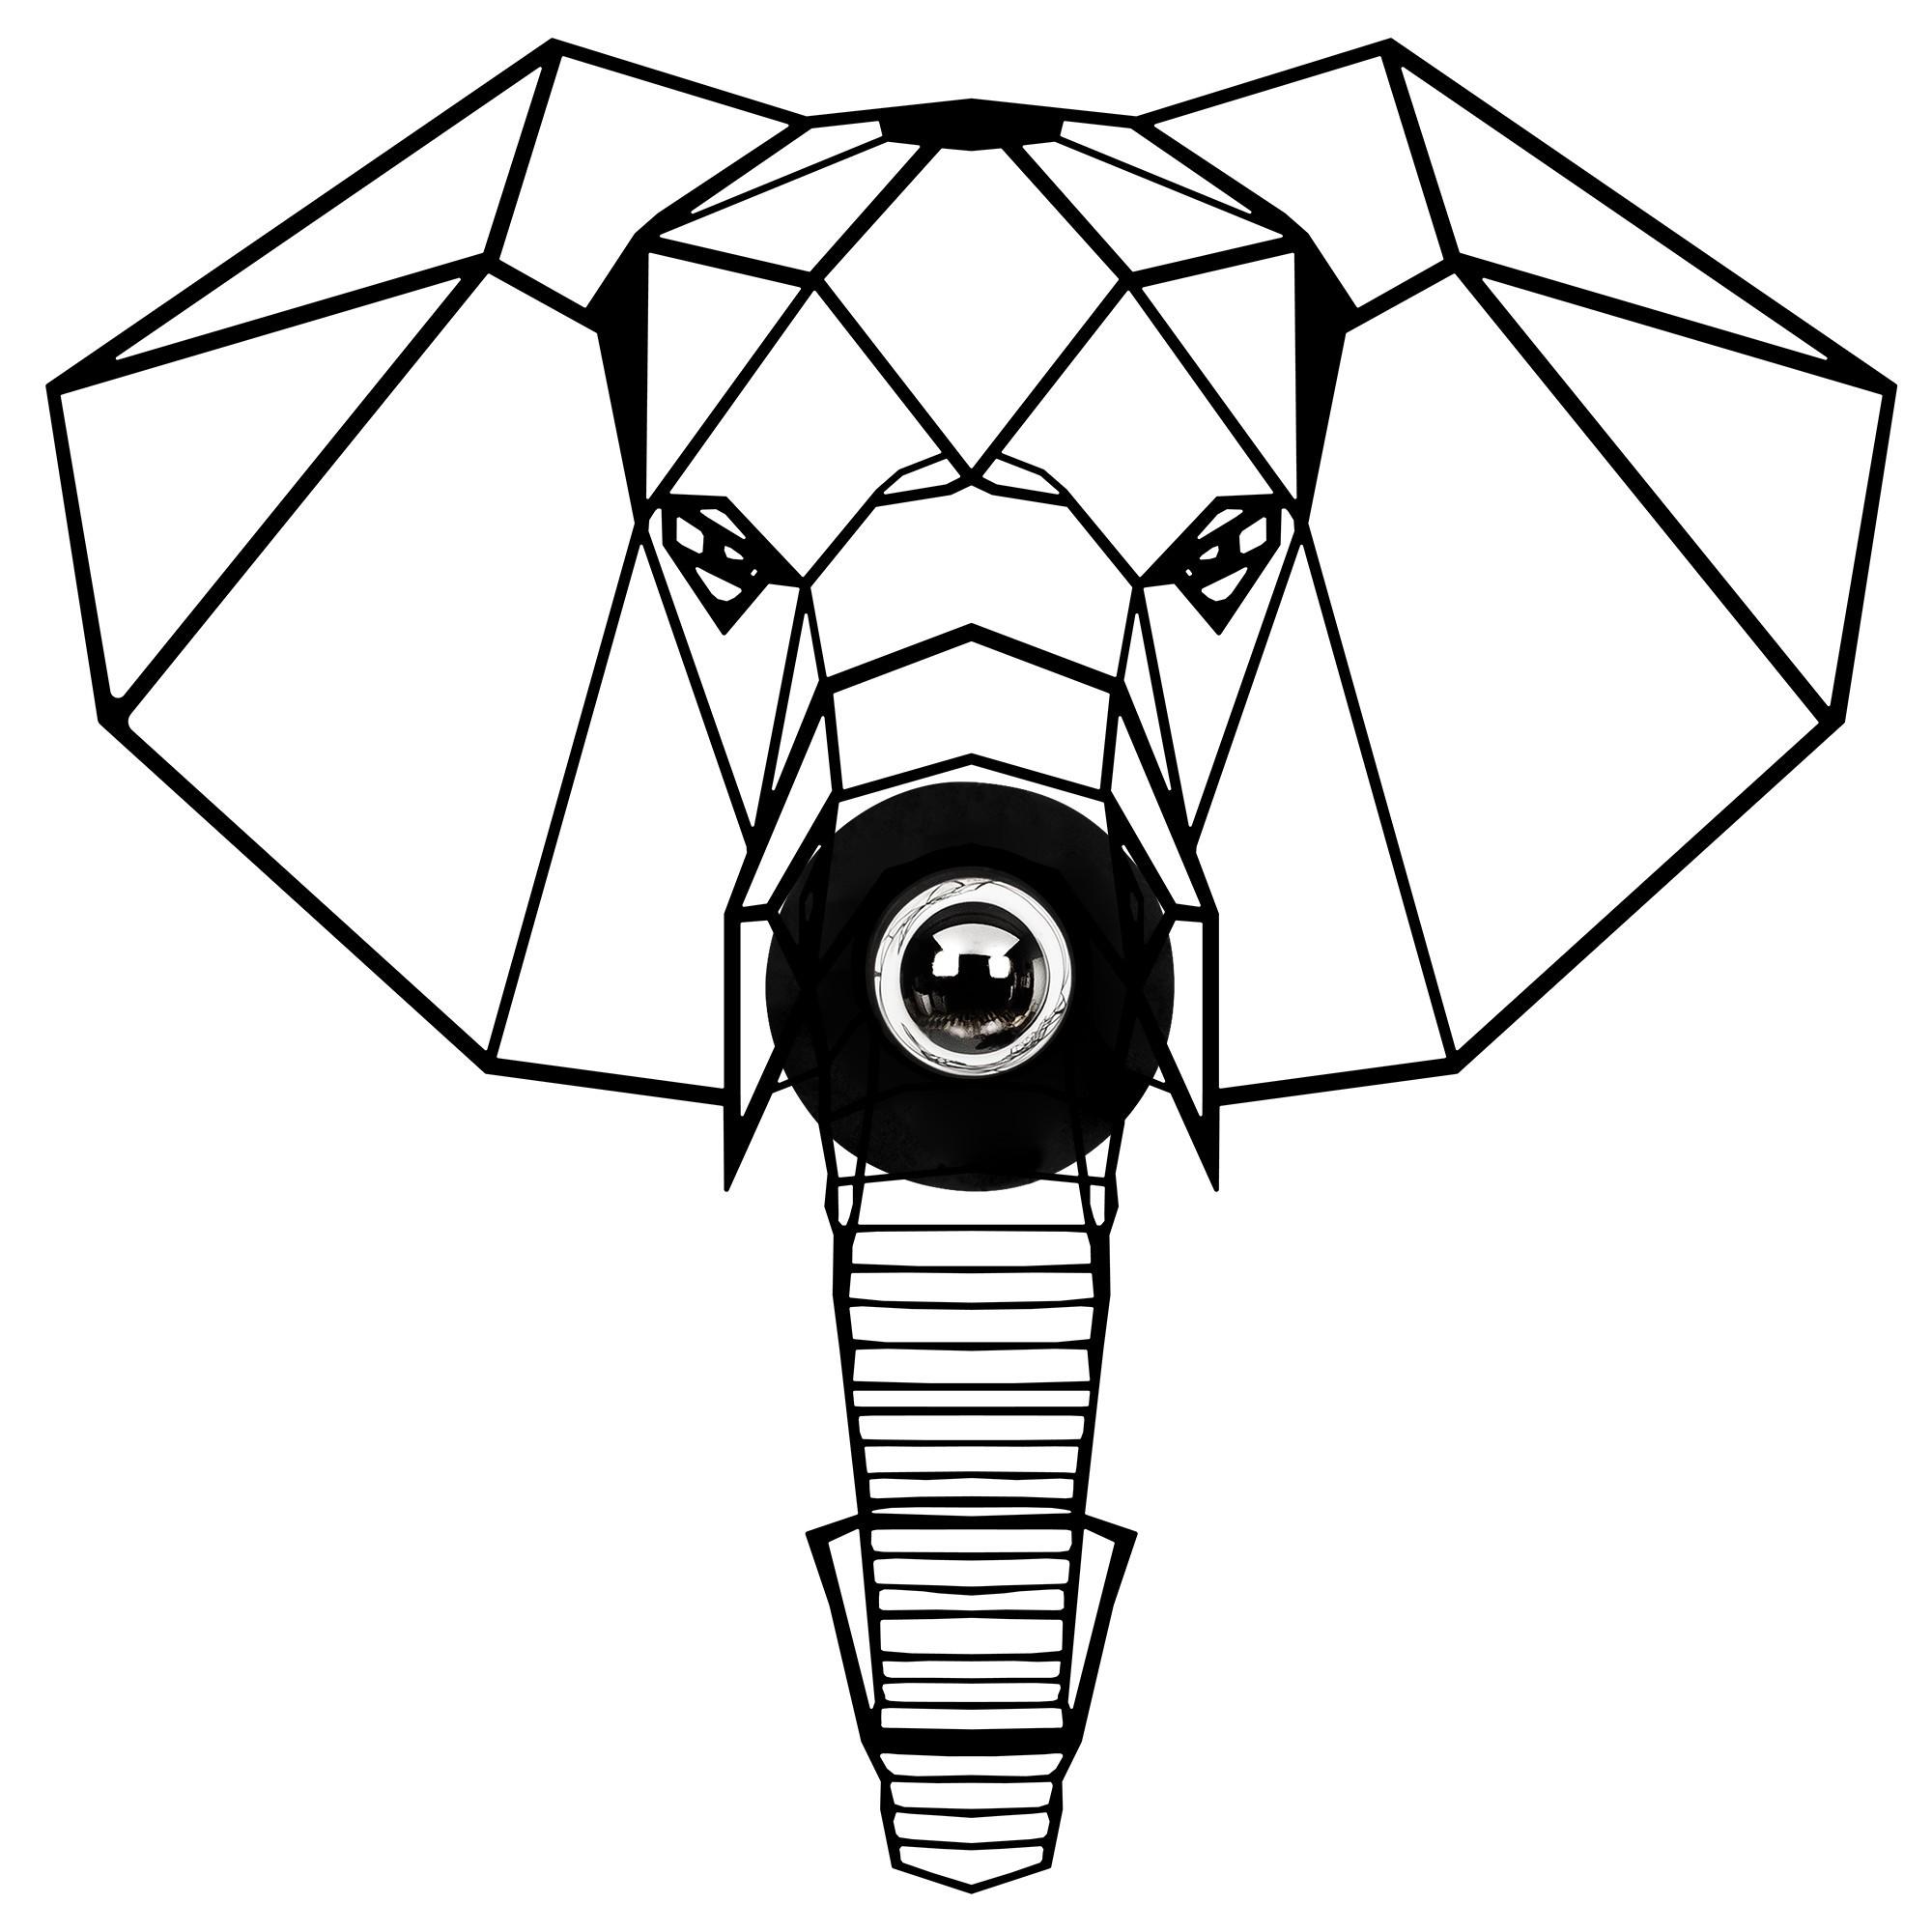 LED industriële wanddeco lamp dieren - Olifant - dimbaar - E27 fitting - vooraanzicht